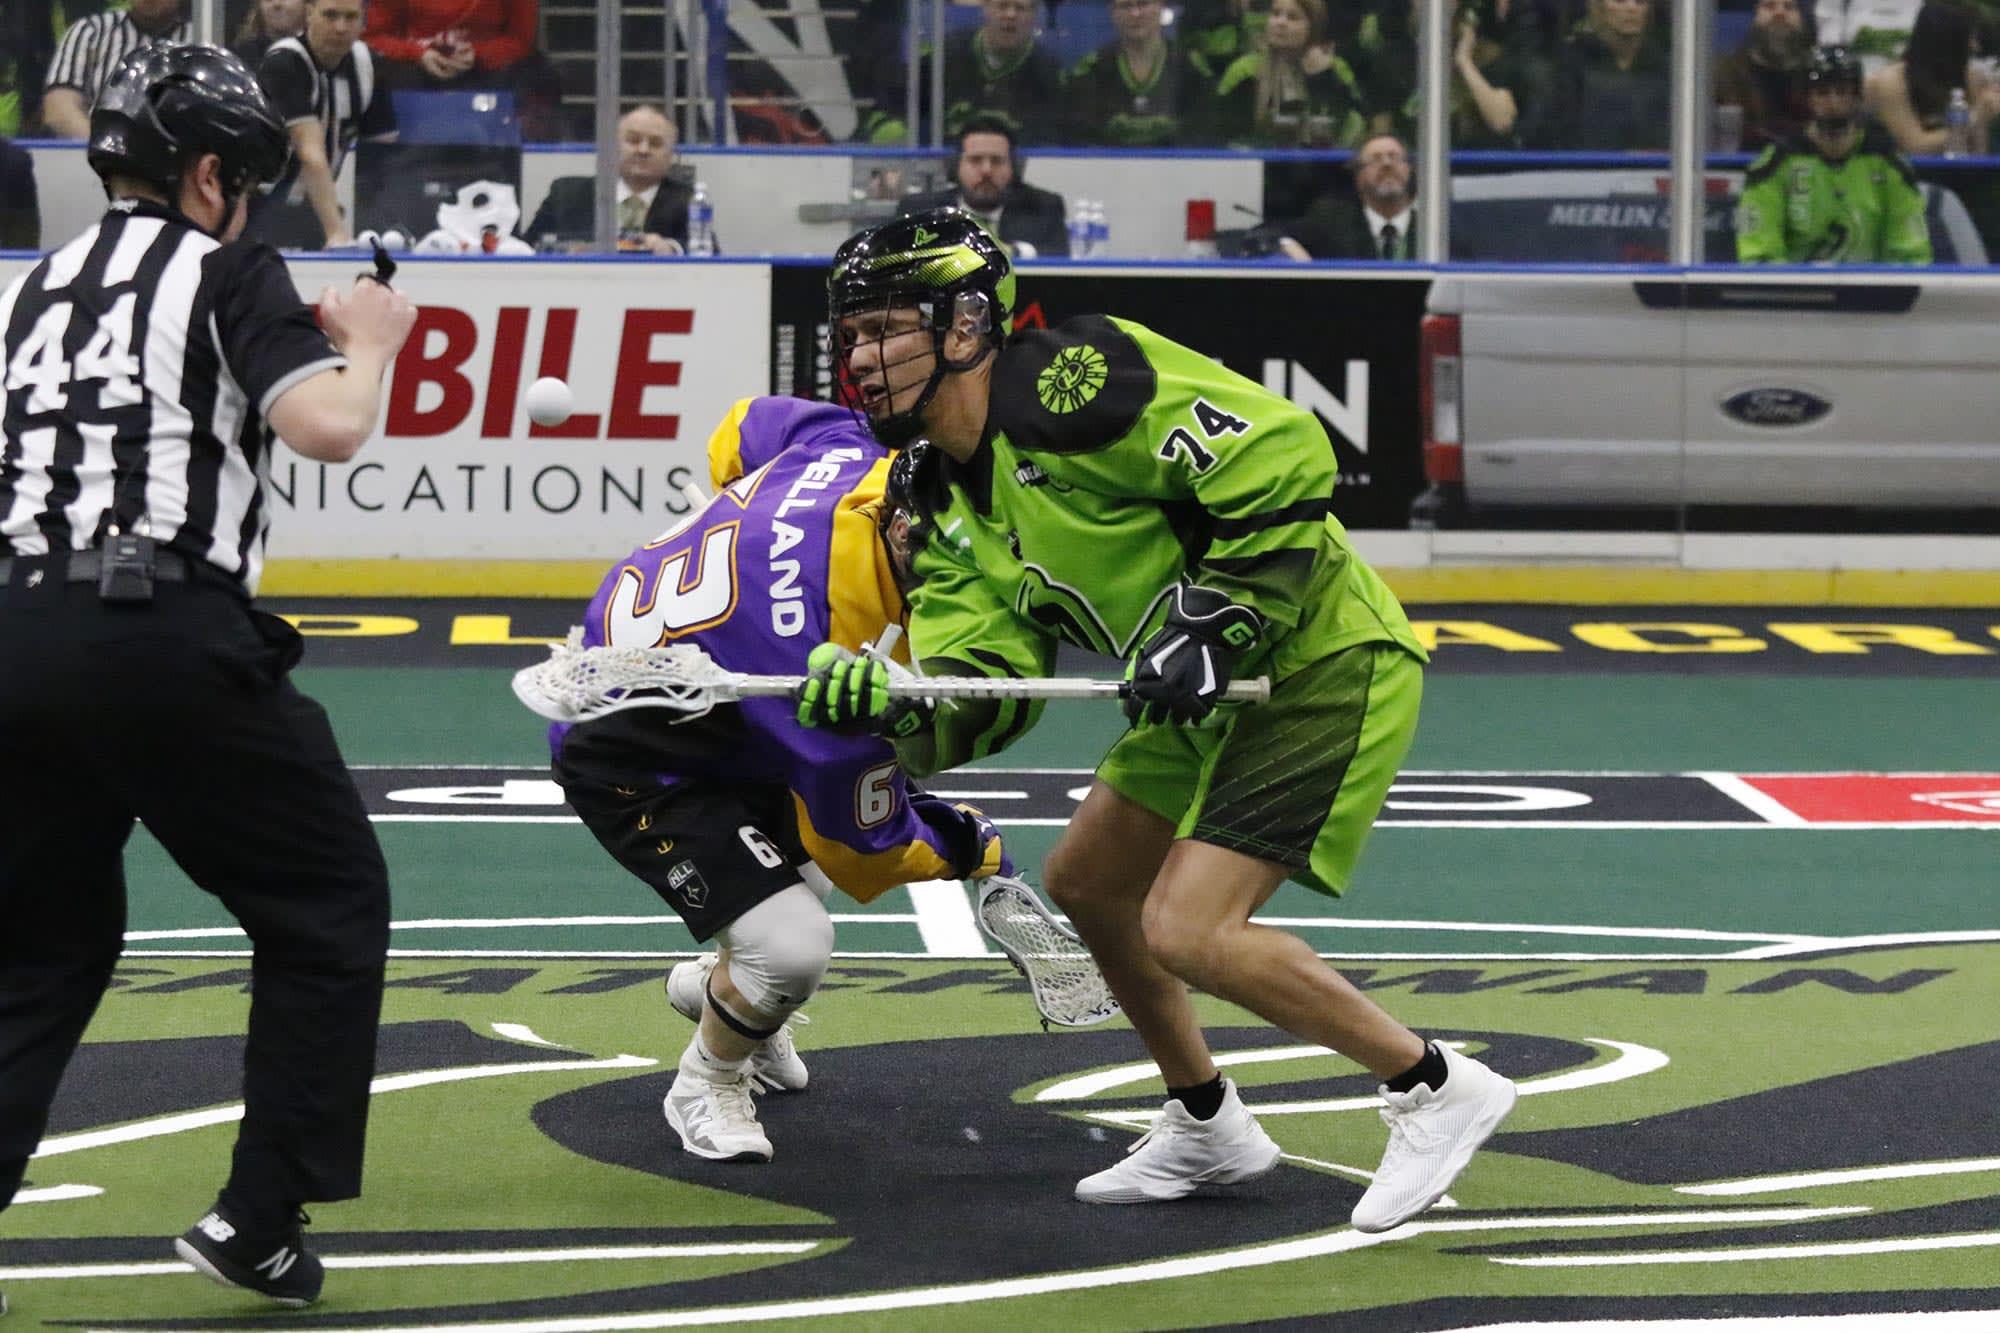 lacrosse gifs nll week 4 national lacrosse league weekly watch guide